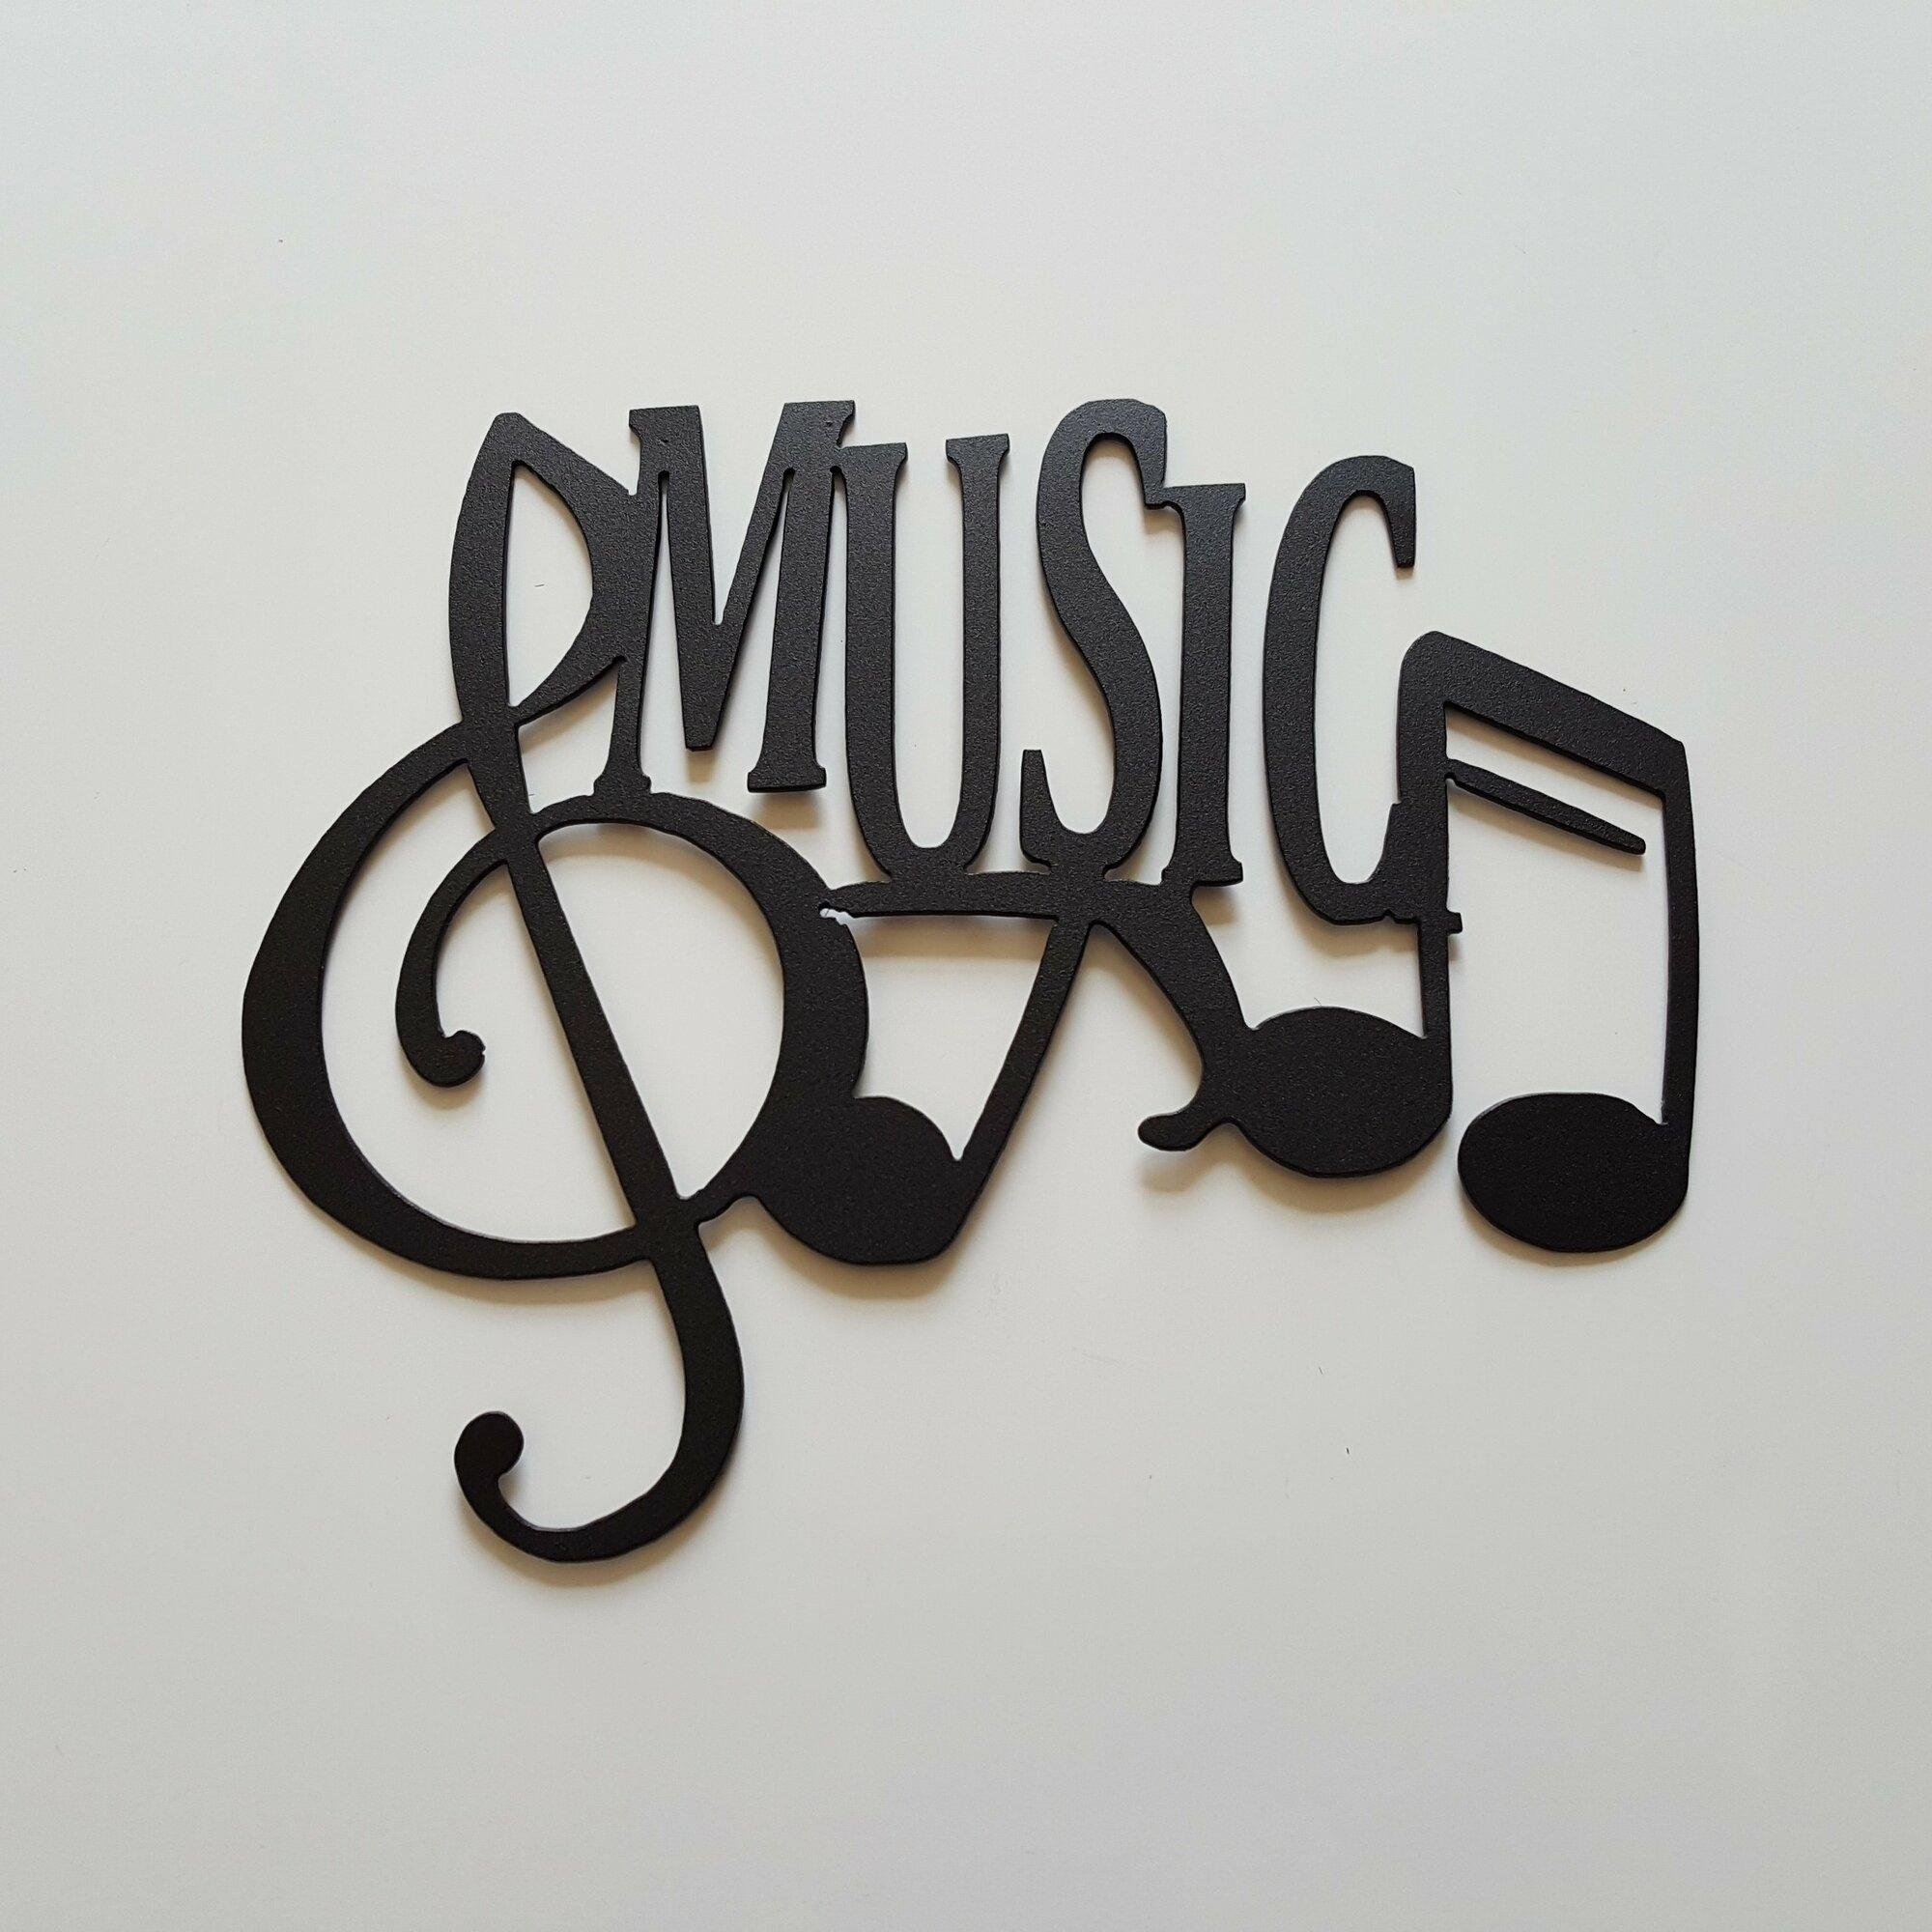 Music Note Wall Decor - Visual Hunt